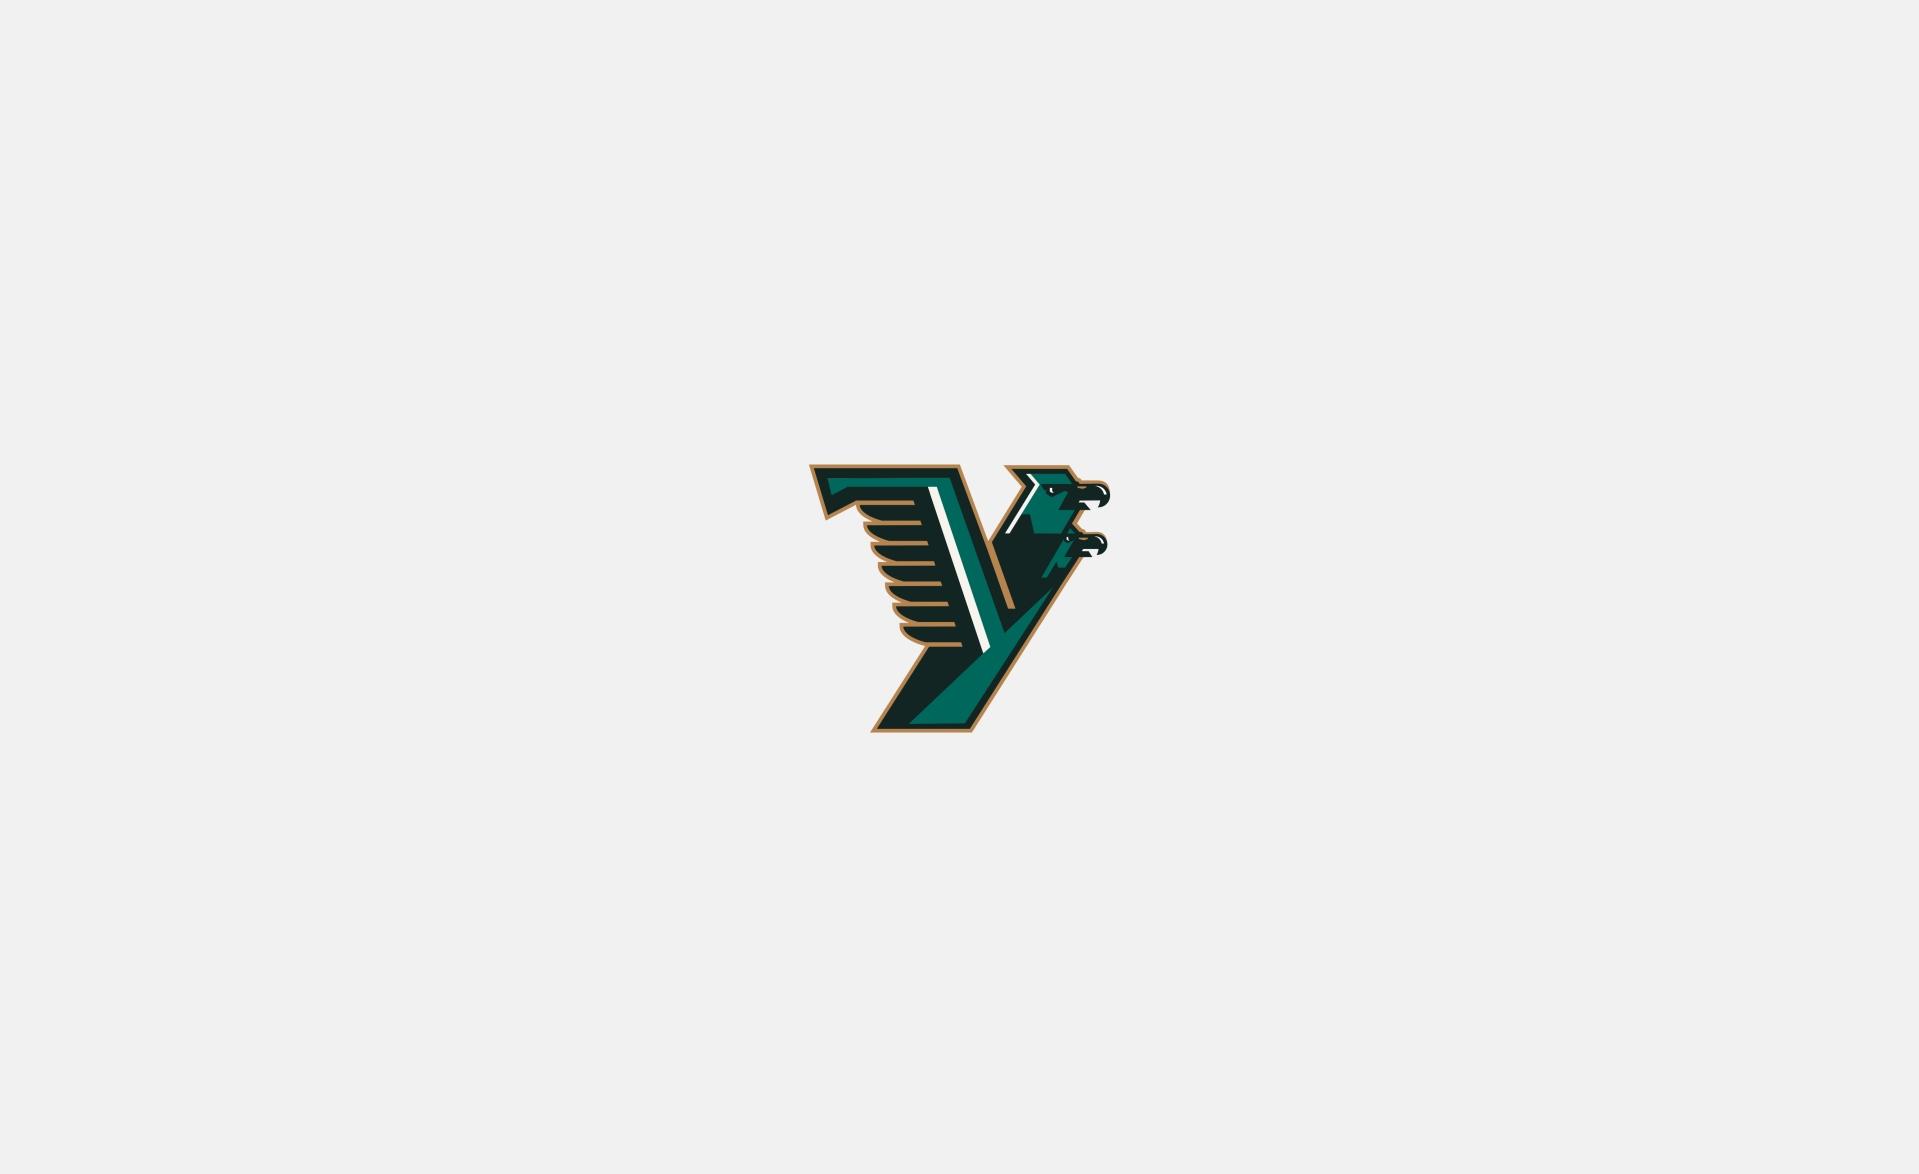 zeki-michael-design-yefi-logo-usa-states-freelance-designer-liqeur-beer-craft-design-football-helmet-mascot-branding-identity